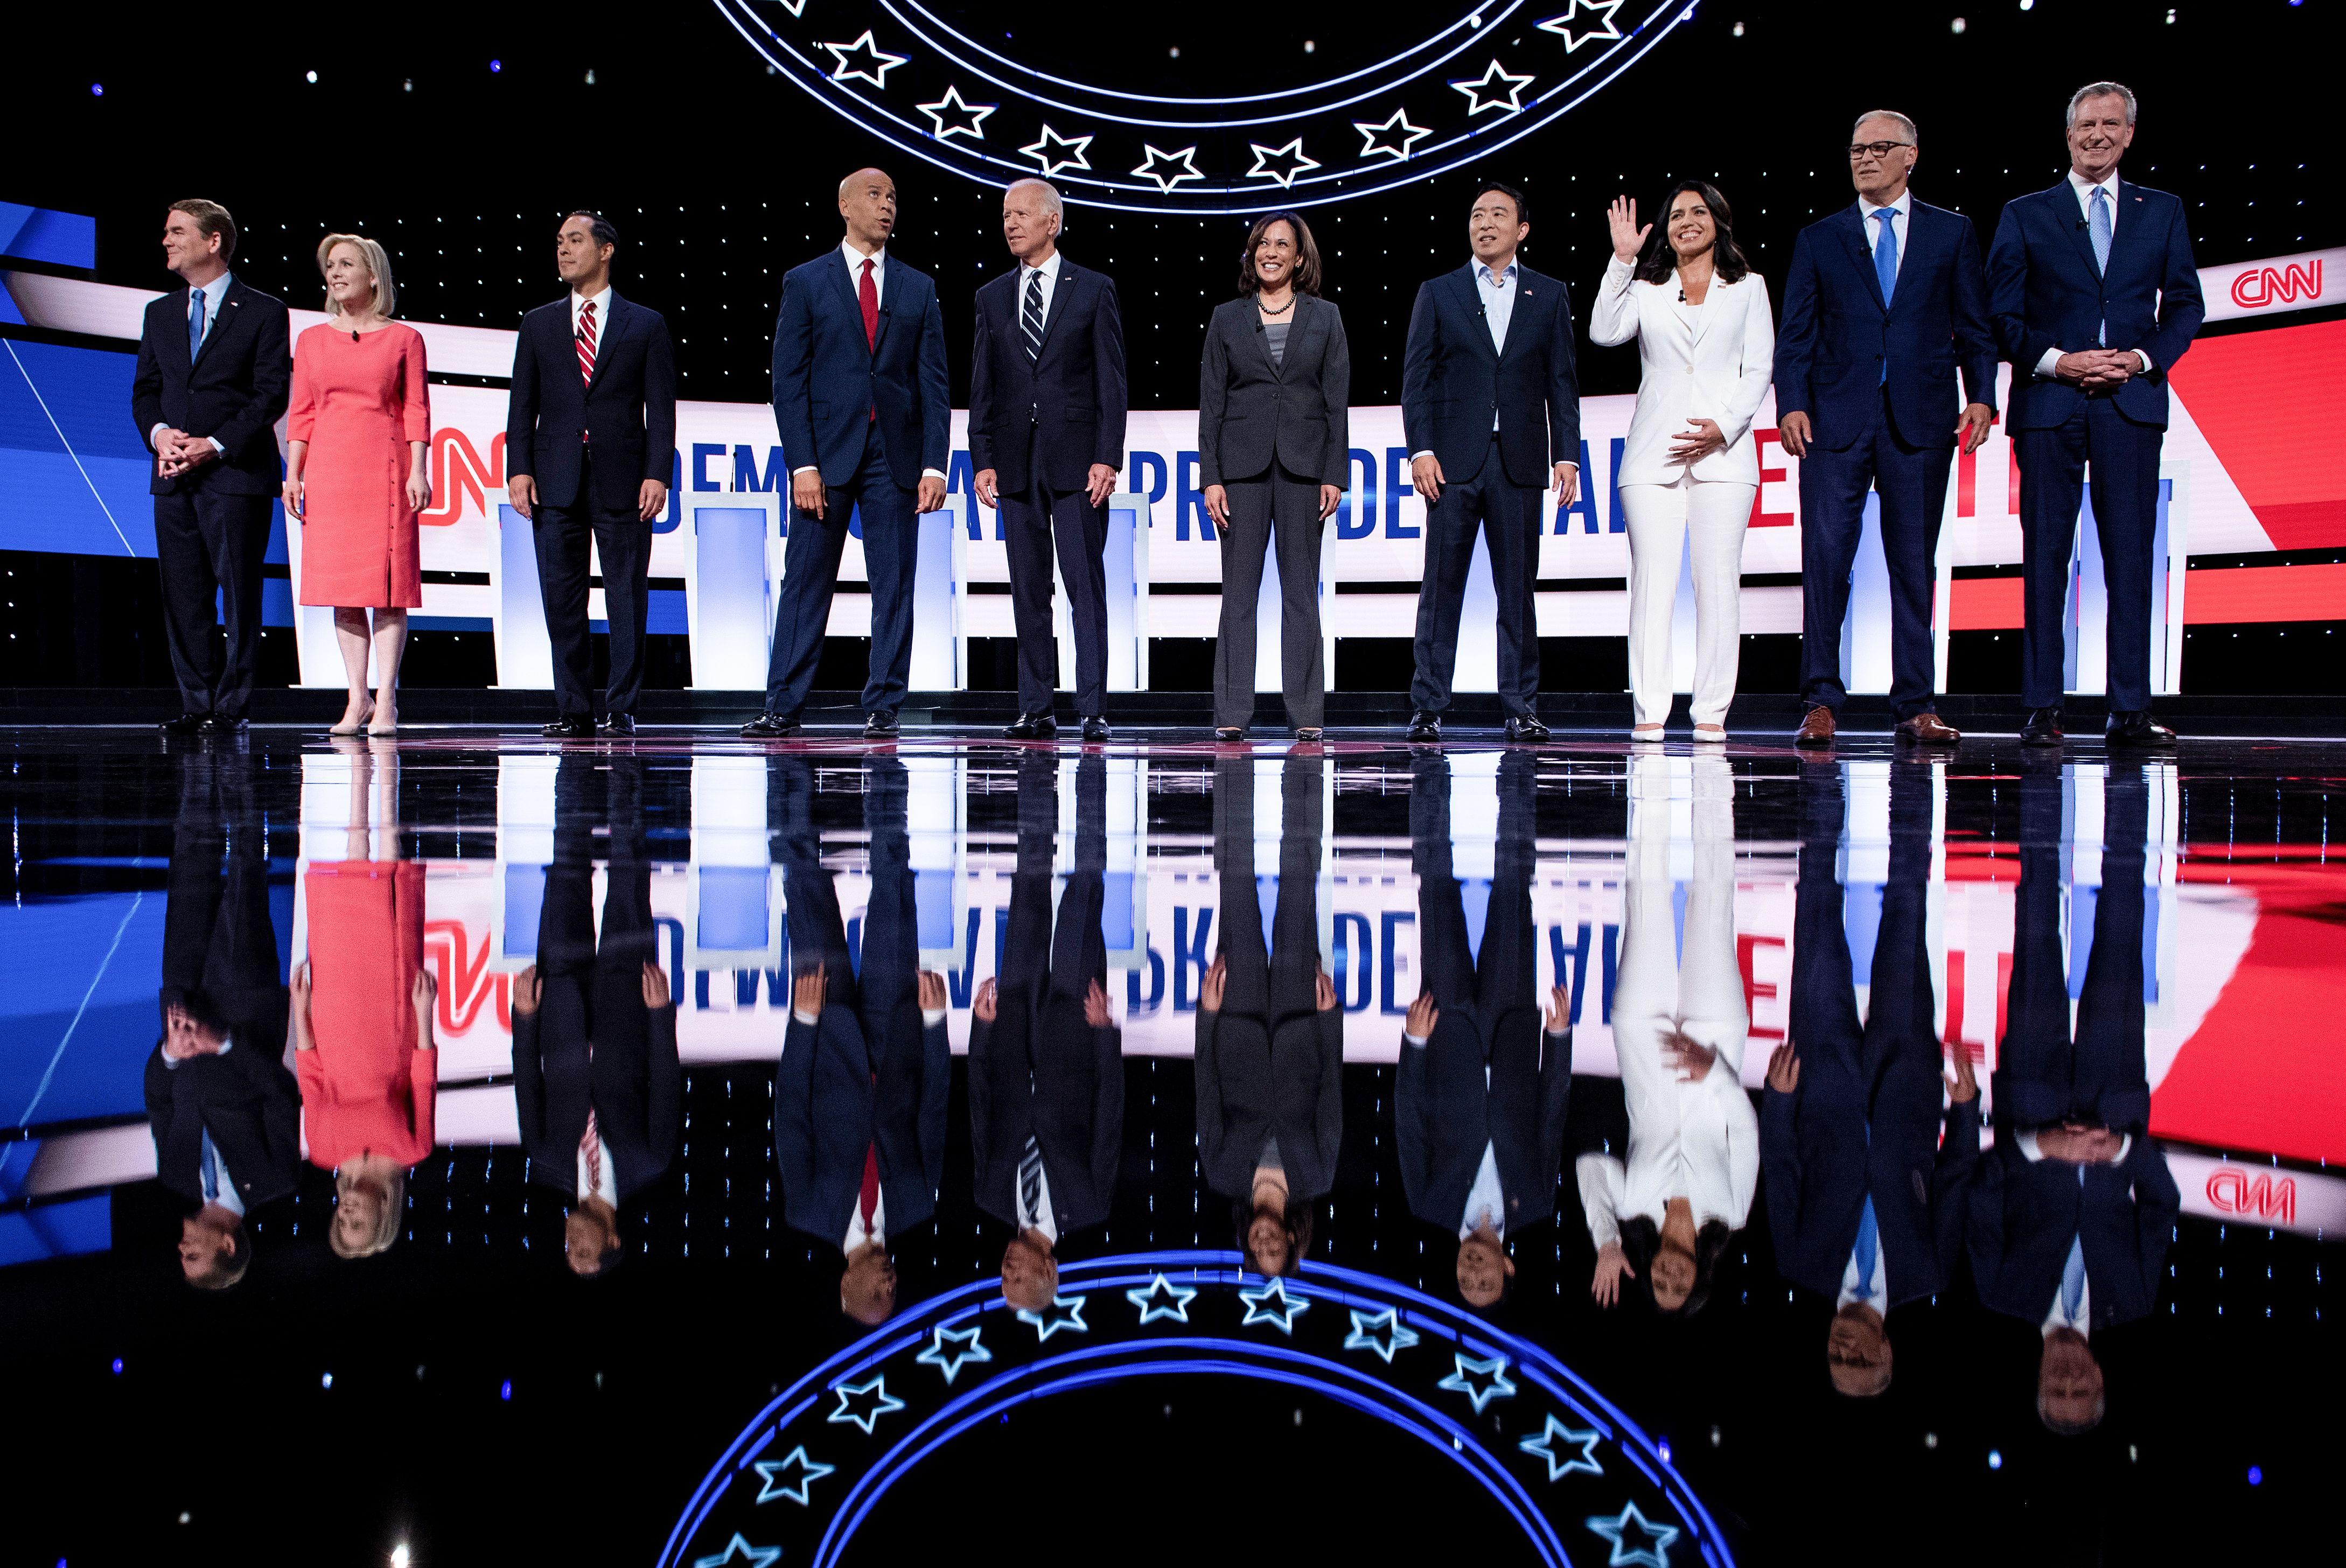 5 key takeaways from the 2nd Democratic debate